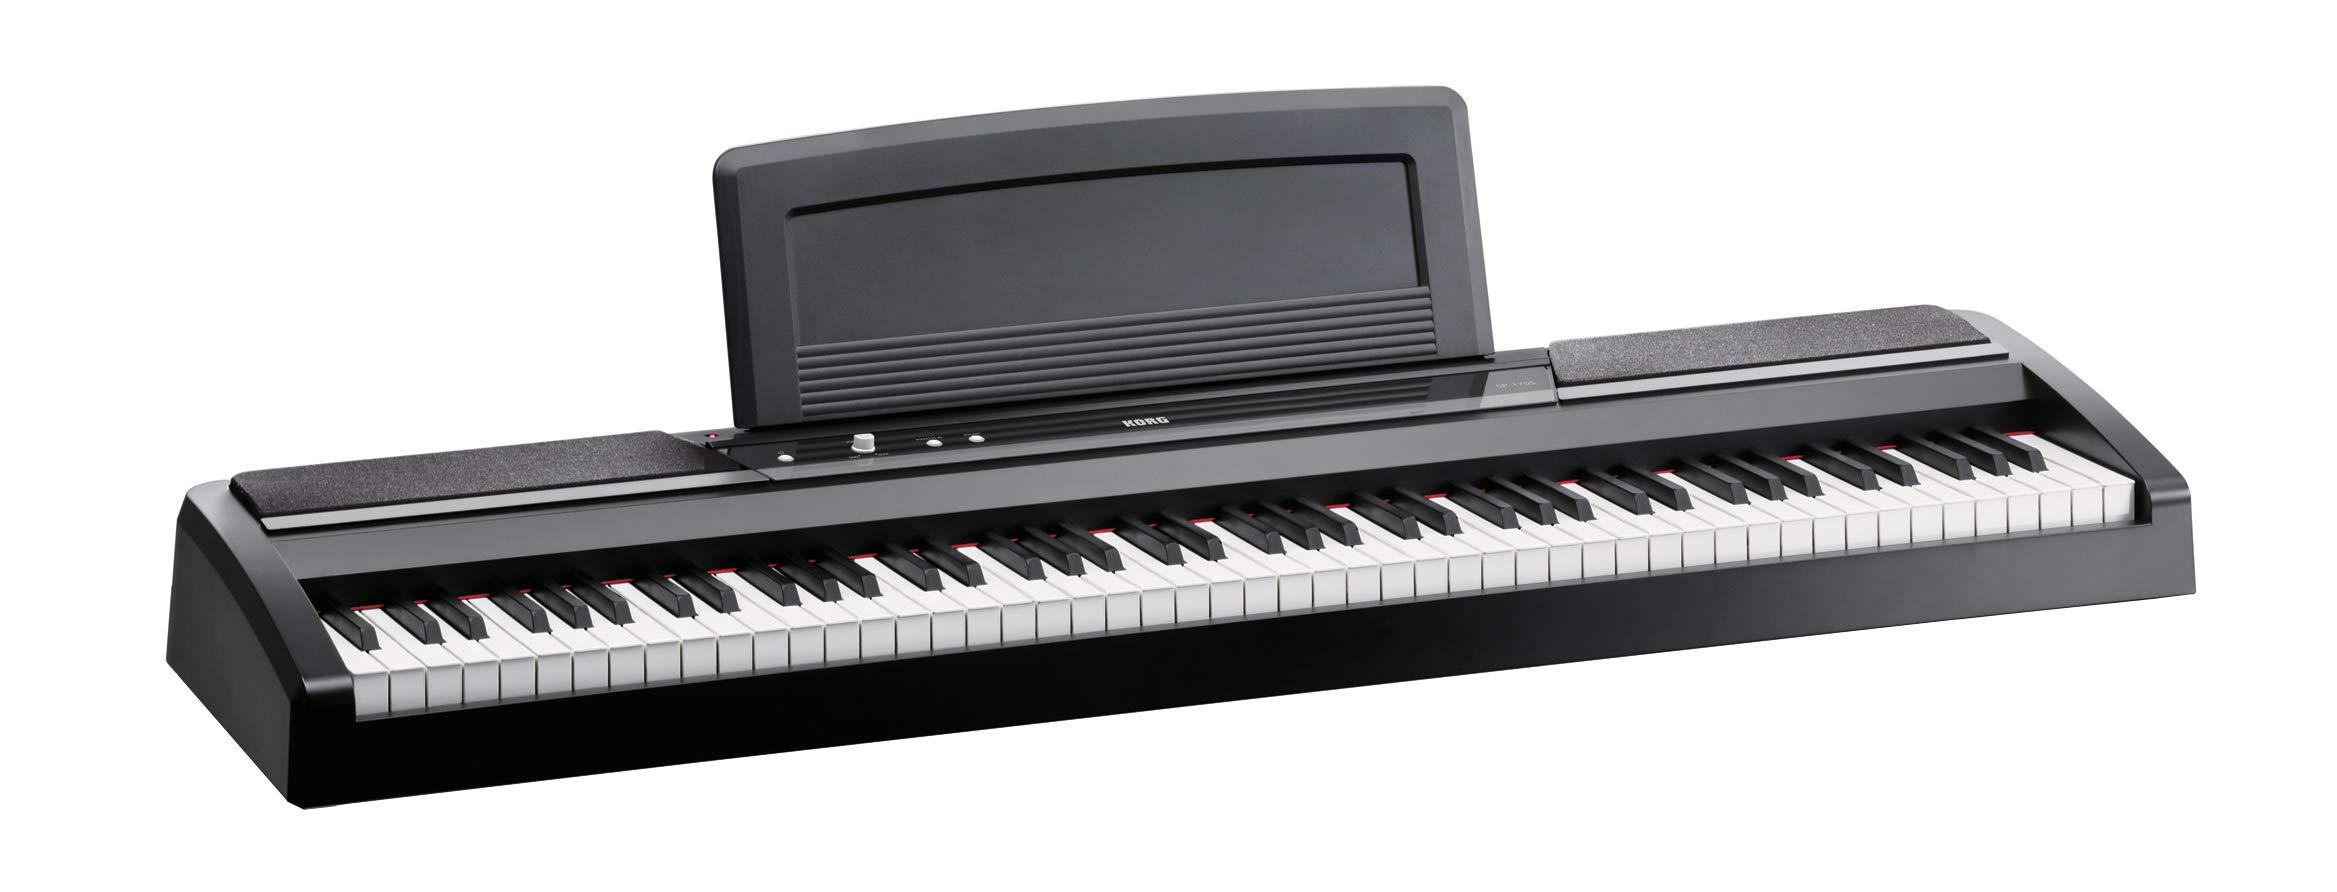 Korg 88-Key Digital Pianos - Home SP170SBK2 by Korg